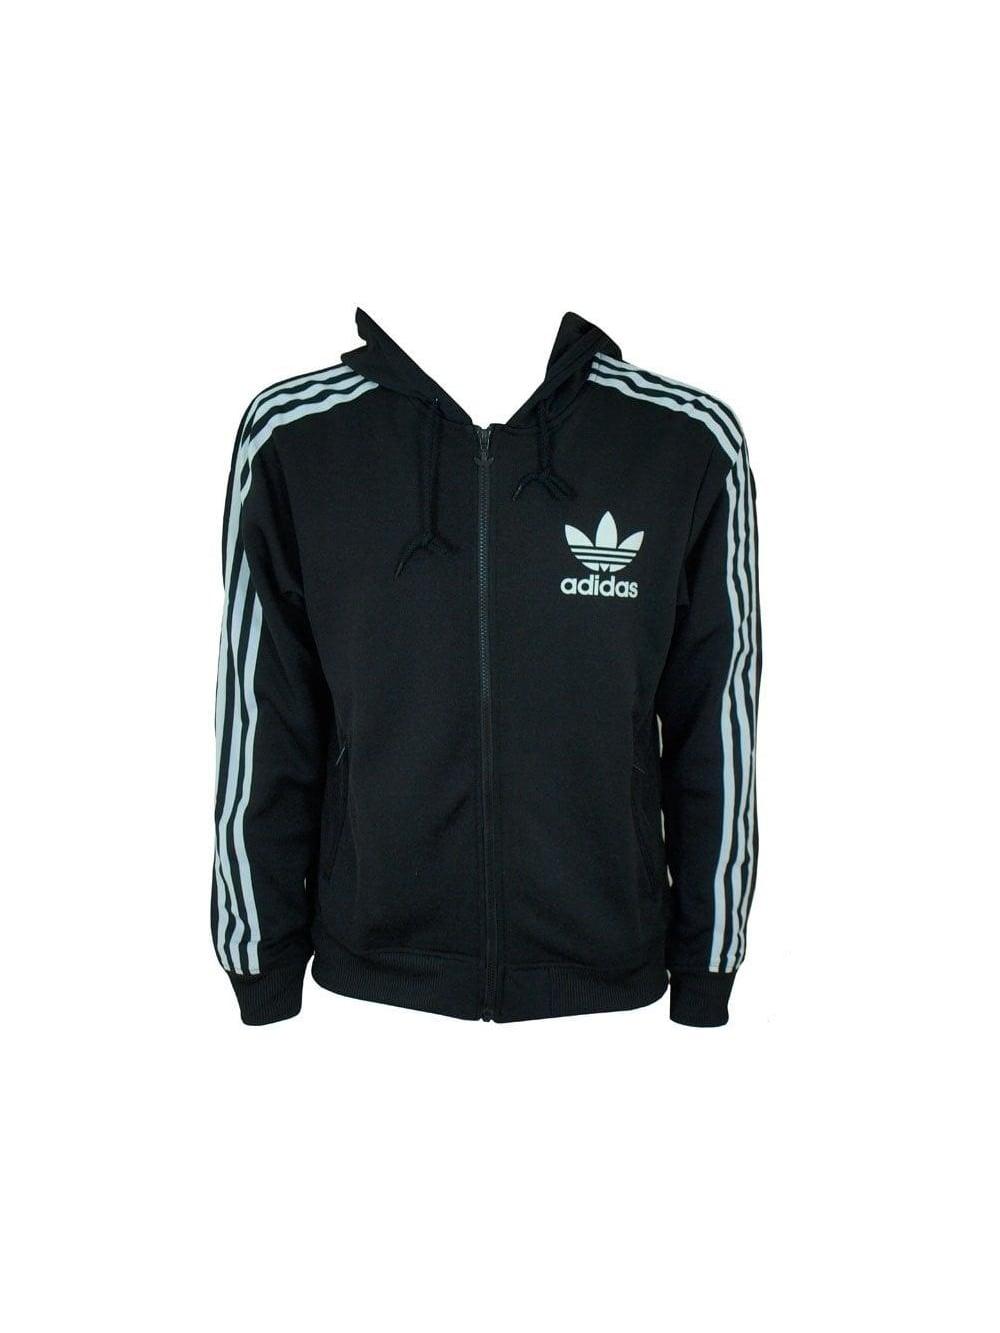 2e45ba0375 Adidas Originals Adi Hooded Flock Jacket in Black - Shop Adidas ...